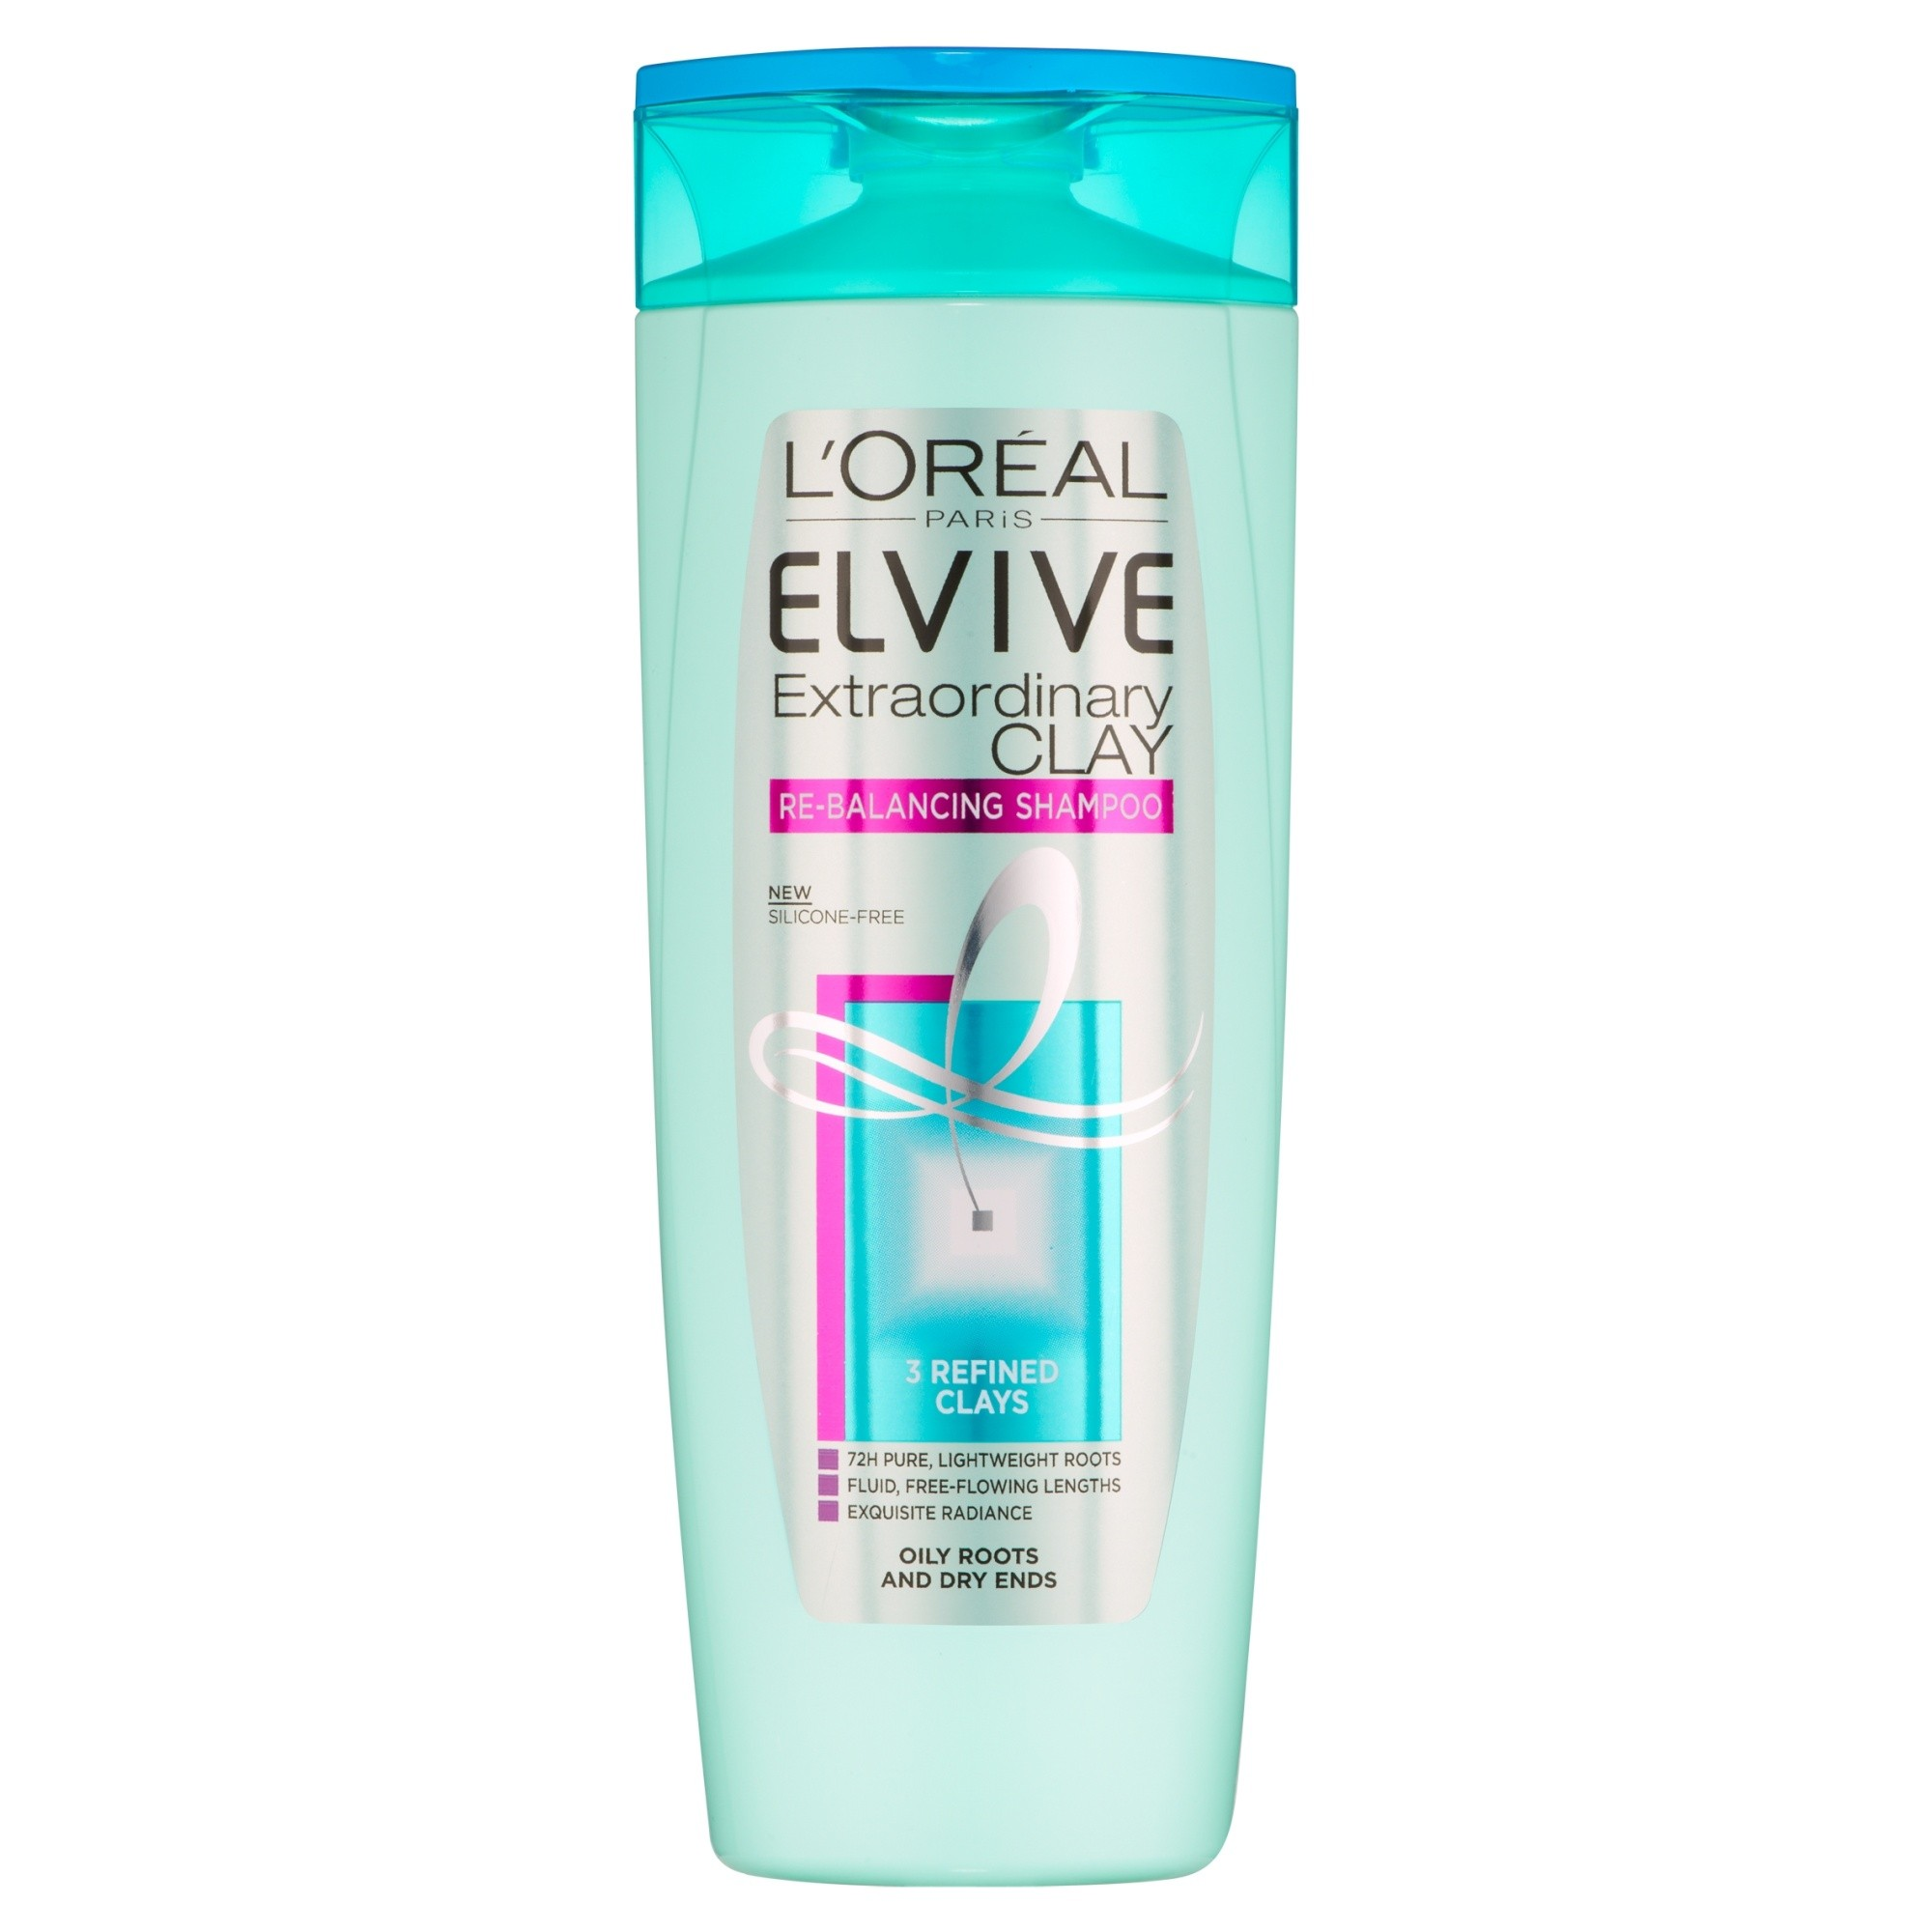 L'Oreal Paris Elvive Extraordinary Clay Re-Balancing Shampoo